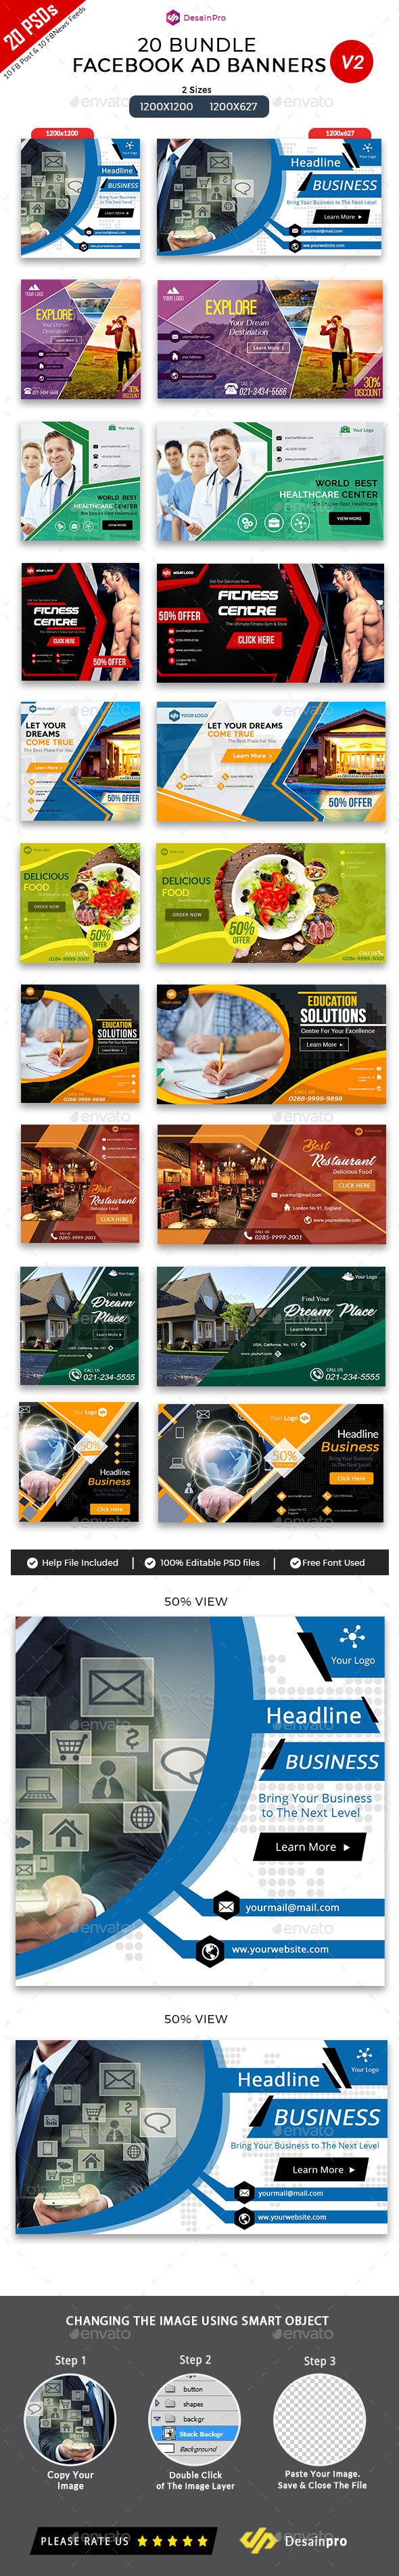 20 Facebook Ad Banners V2 Bundle - AR - Social Media Web Elements